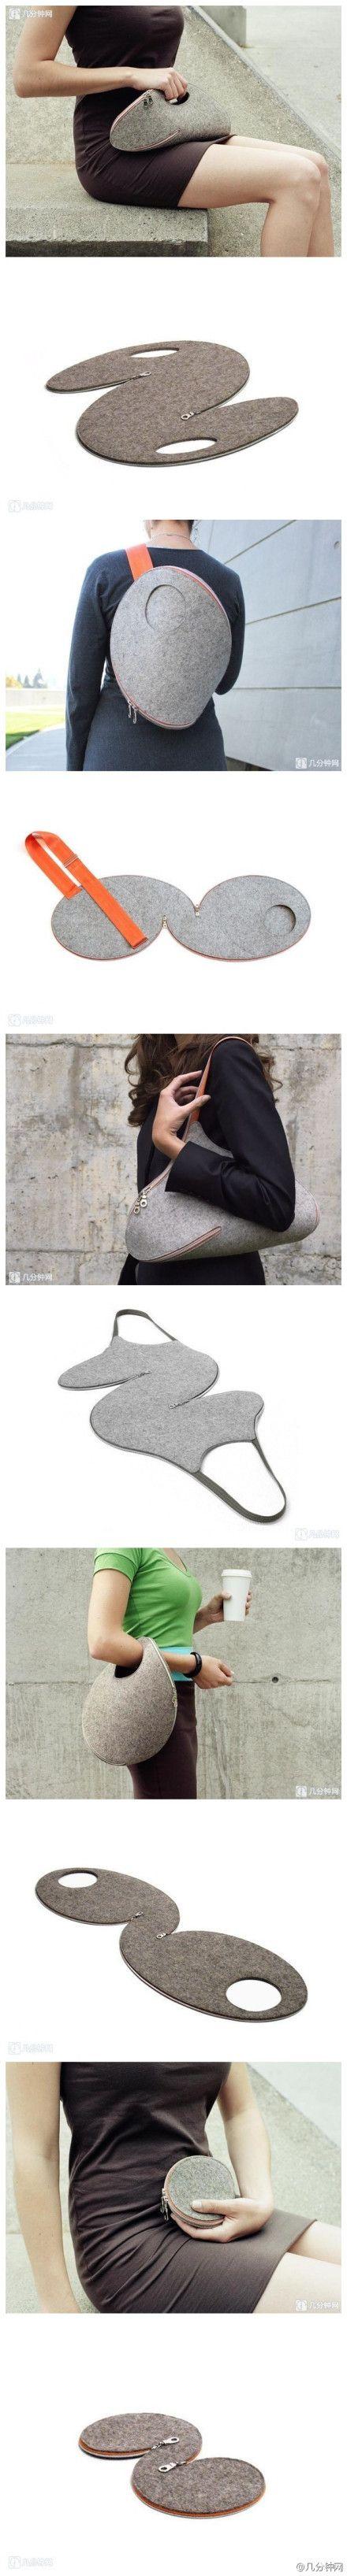 DIY Cool Lady Bag